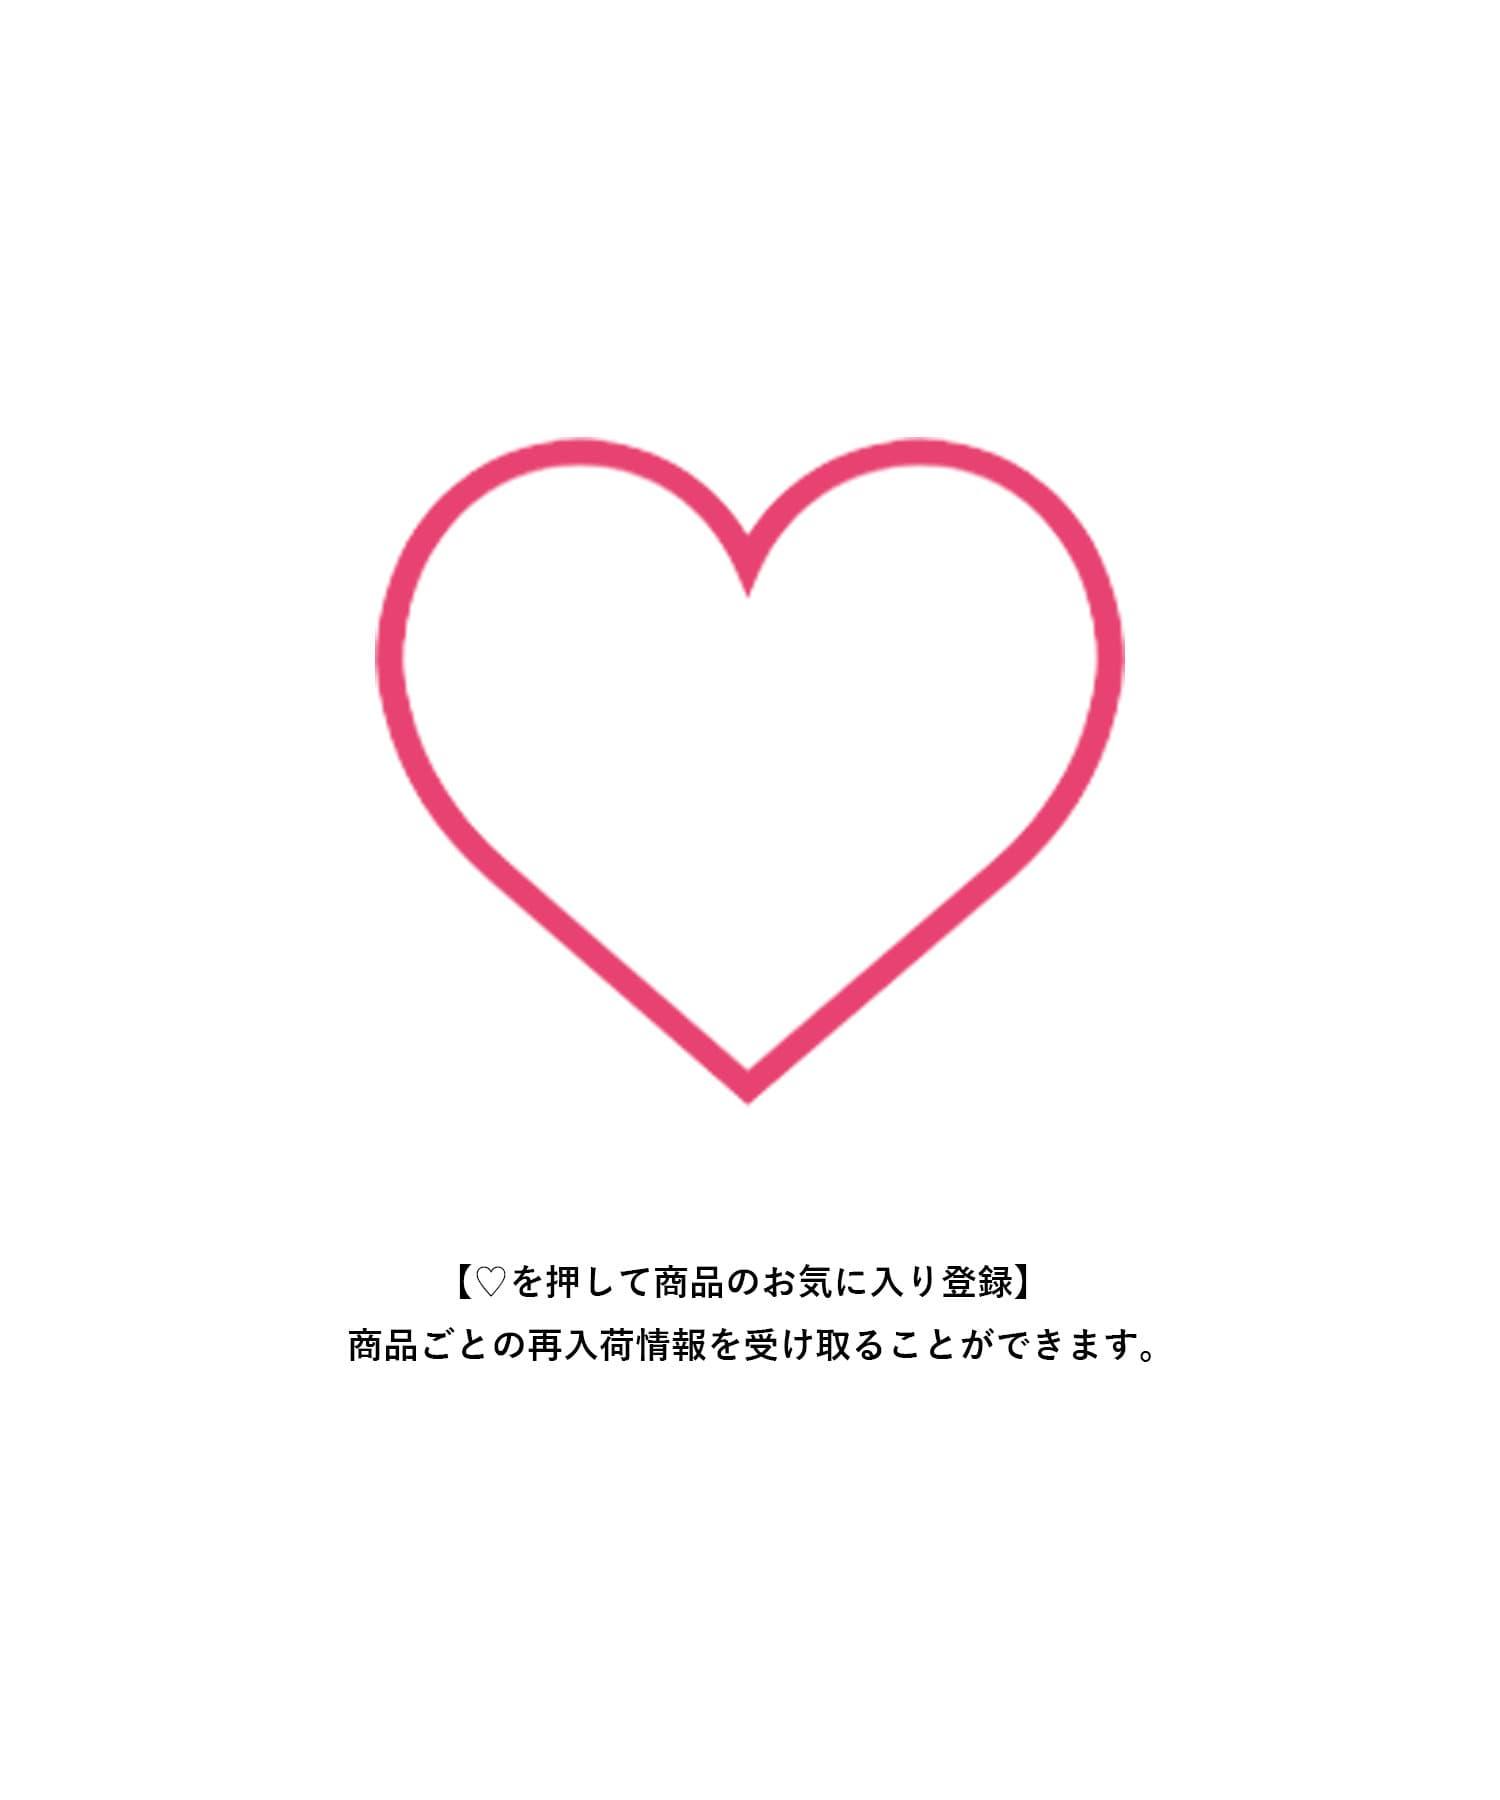 COLLAGE GALLARDAGALANTE(コラージュ ガリャルダガランテ) 【PAPILLONNER/パピヨネ】メタルチョーカー